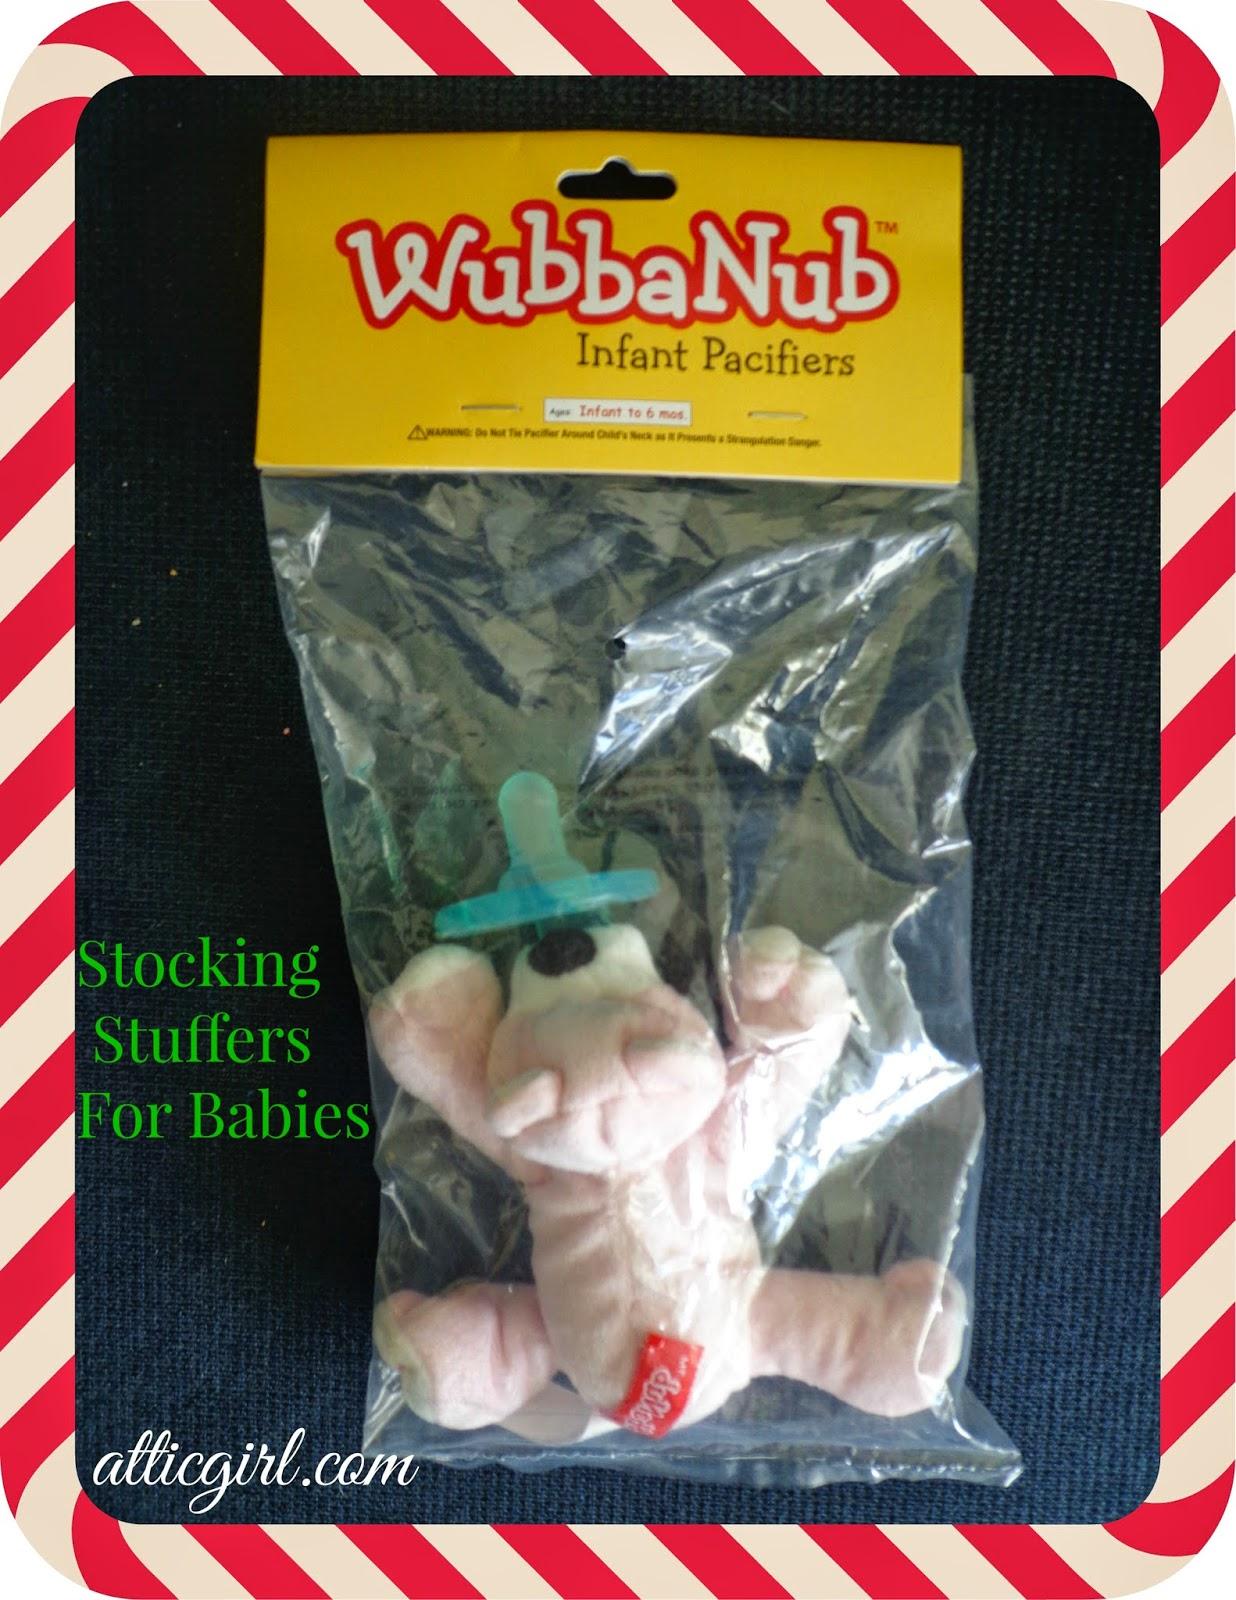 WubbaNub Stocking Stuffers for Babies